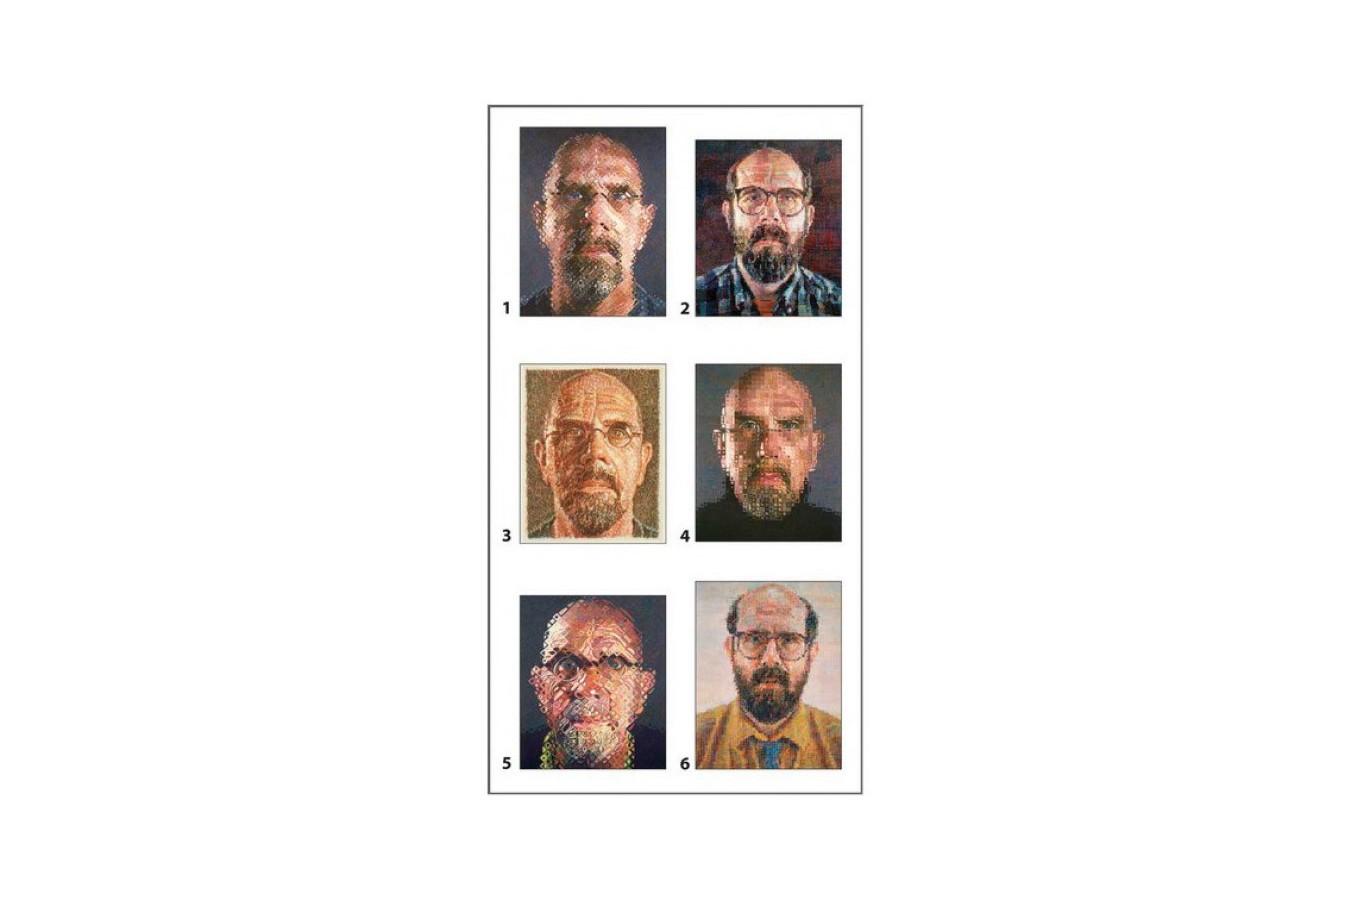 Puzzle cuburi Pomegranate - Chuck Close: 12 cubes for six self-portraits, 12 piese (PB003) imagine